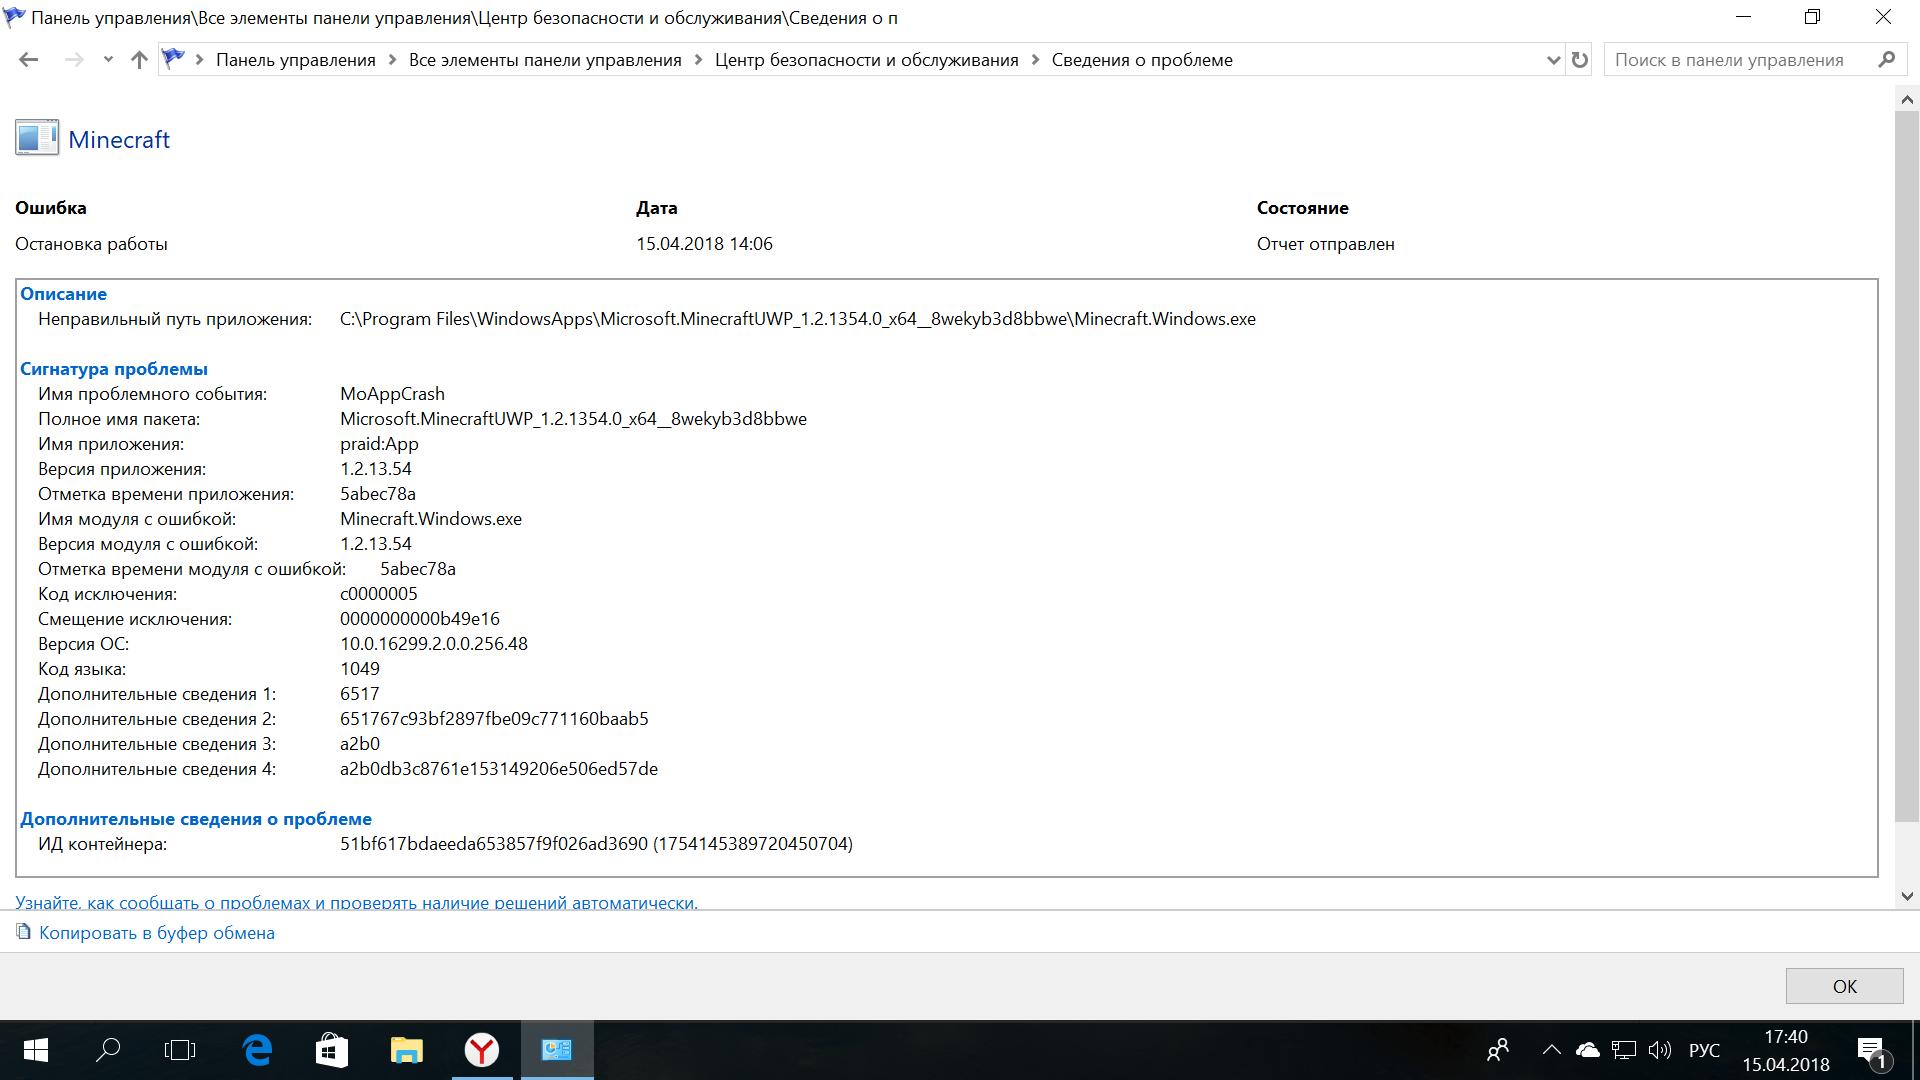 Minecraft Windows 10 Edition crashes out - Microsoft Community